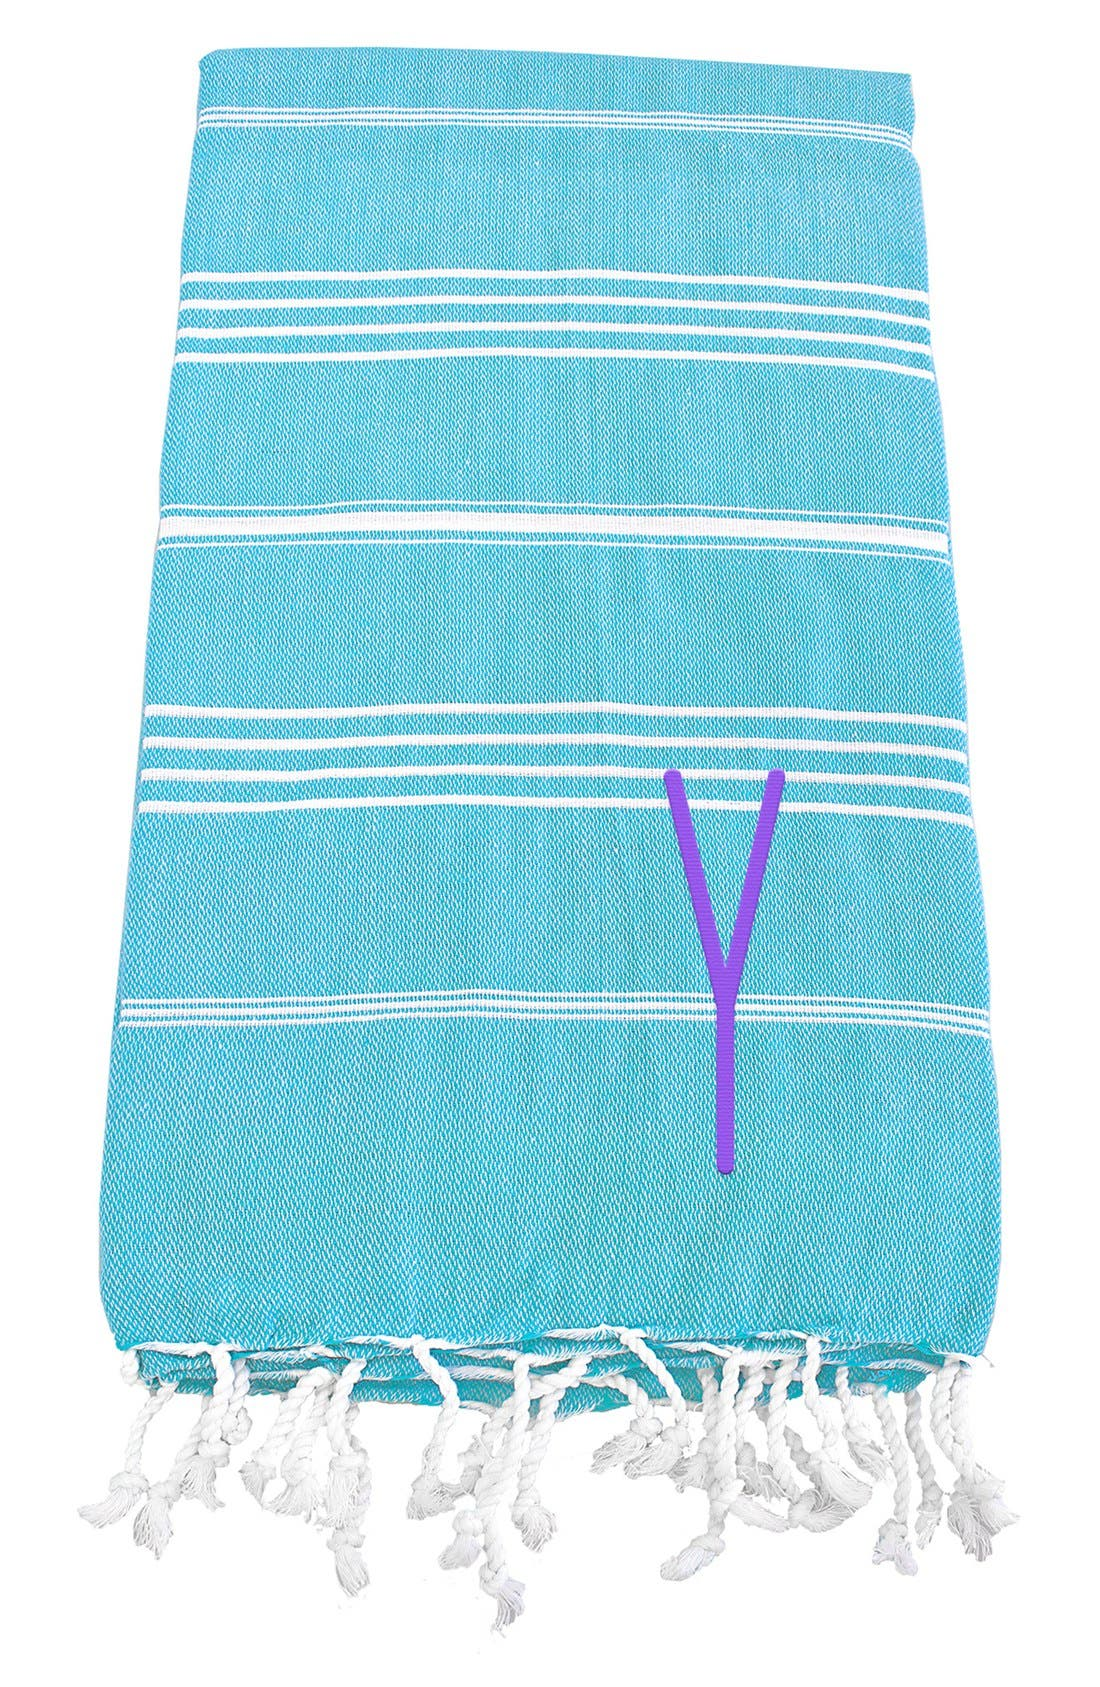 Monogram Turkish Cotton Towel,                         Main,                         color, Turquoise - Y